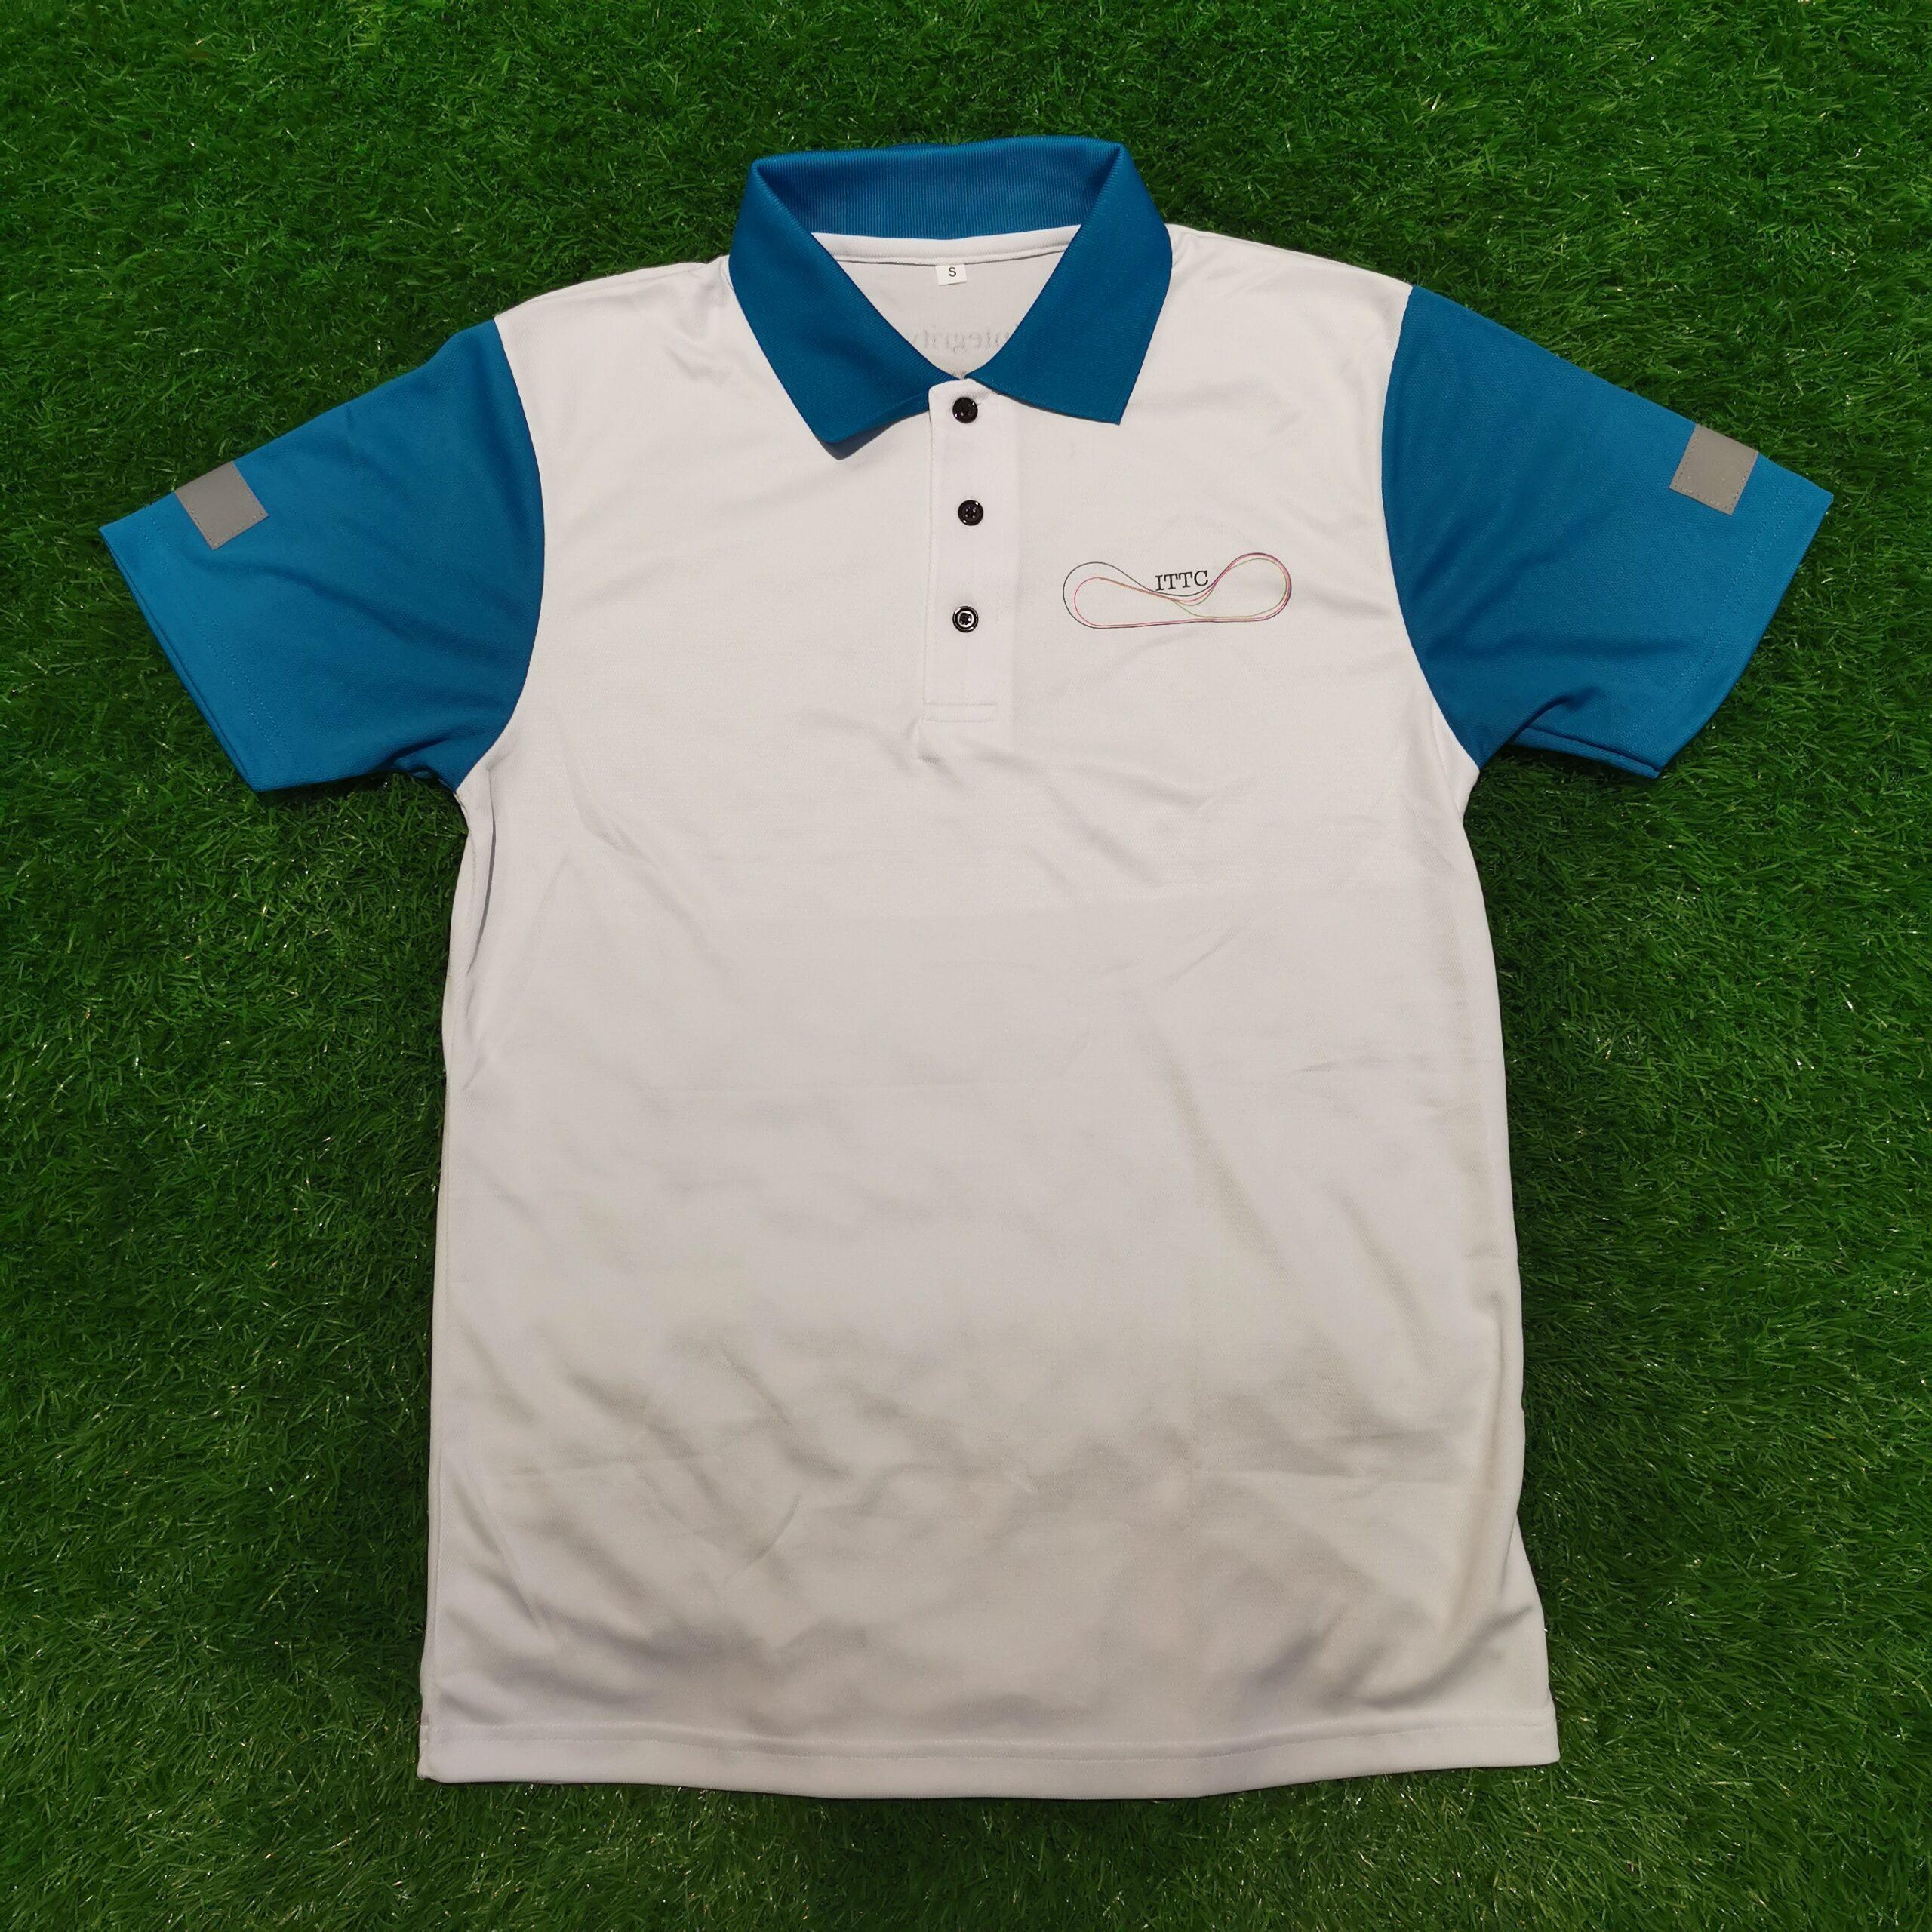 Custom Made Polo Shirt with Reflective Strips